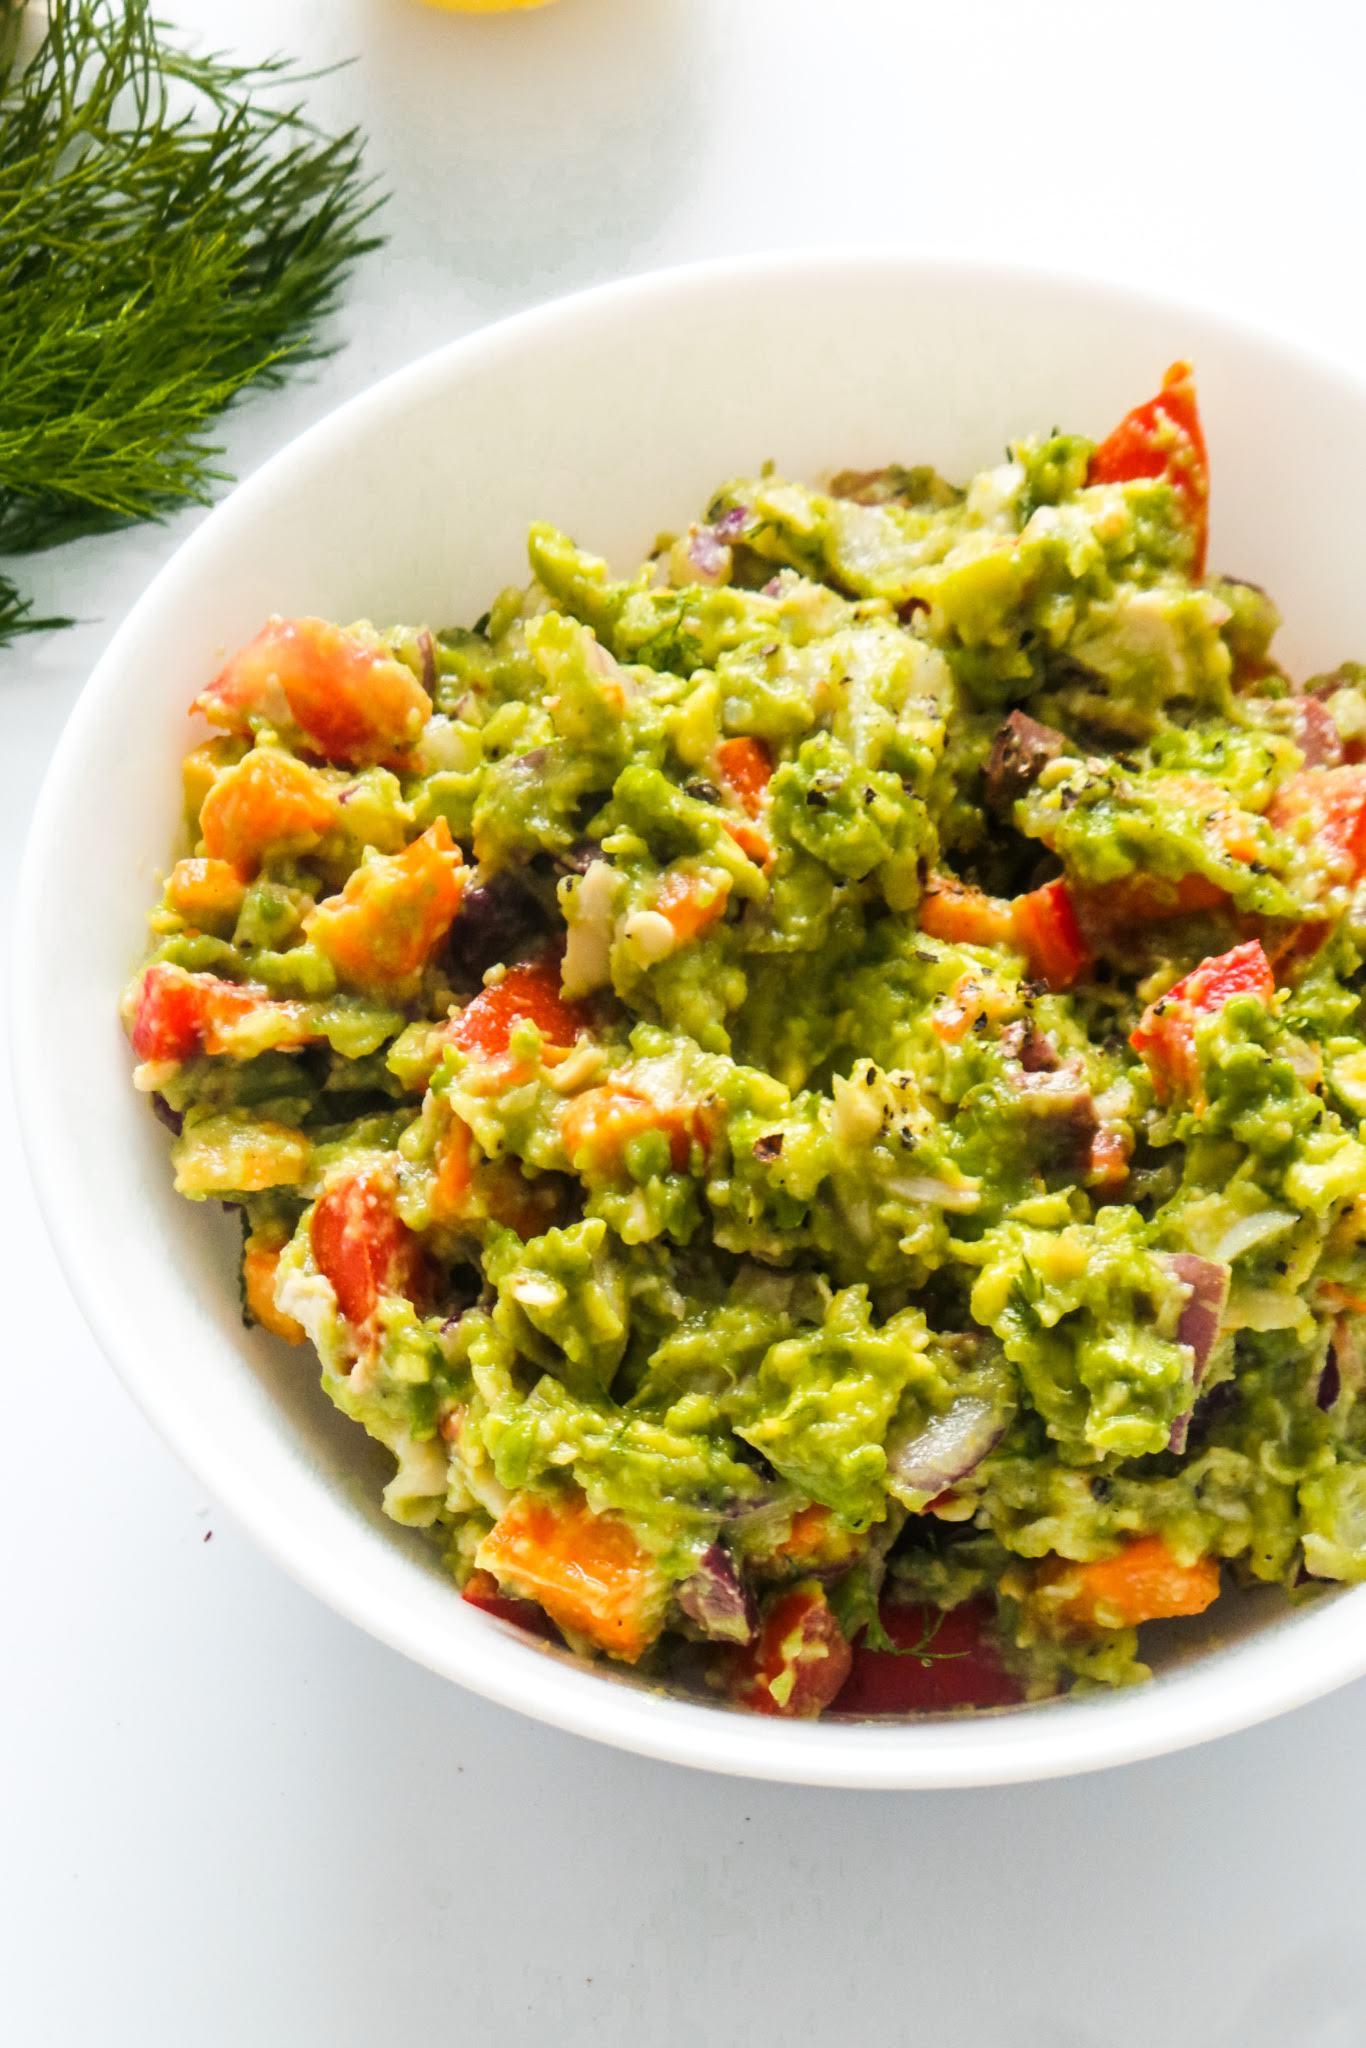 Mashed avocado dill chicken salad - easy chicken salad recipes